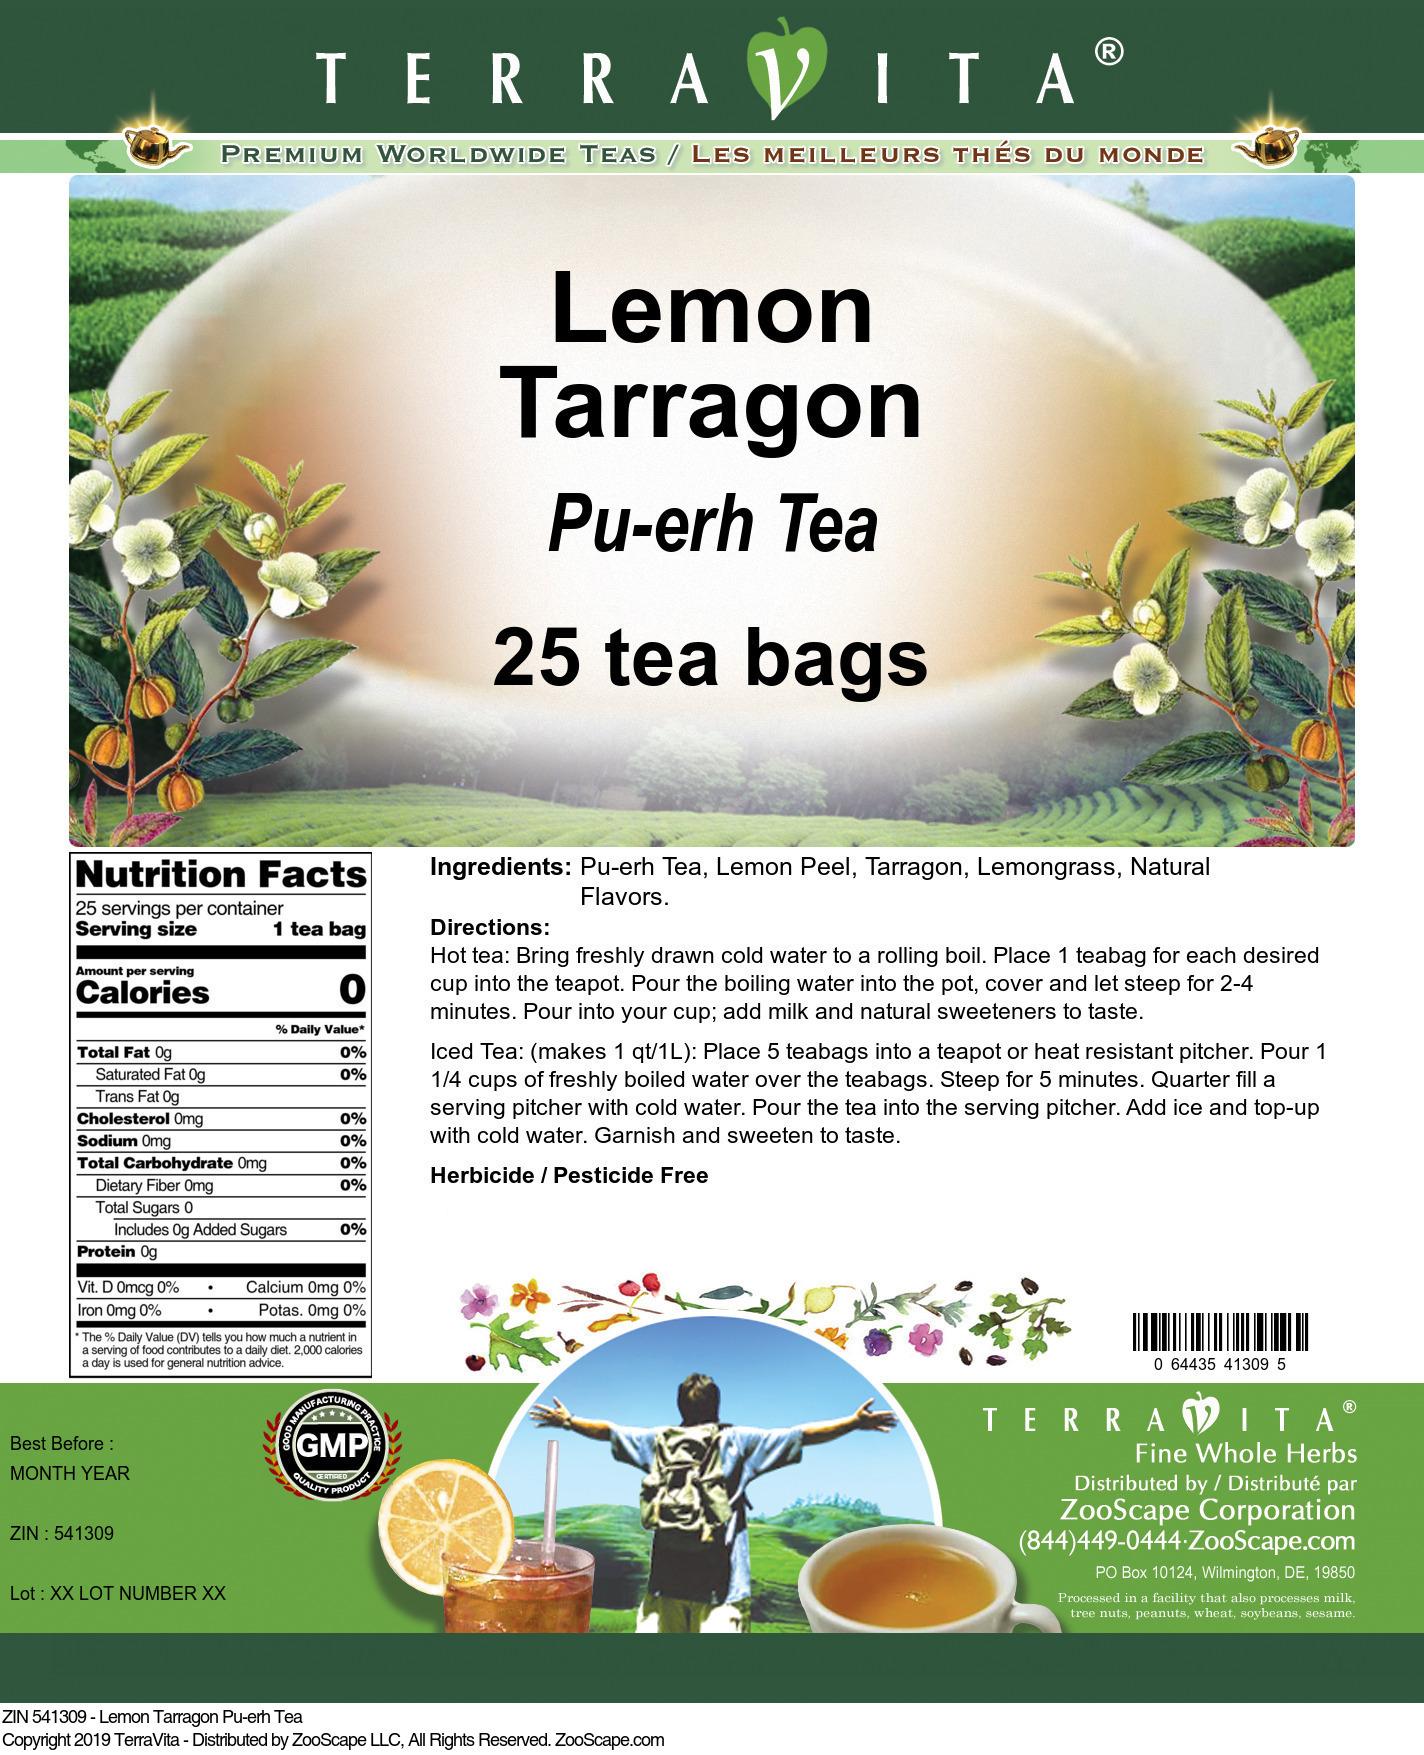 Lemon Tarragon Pu-erh Tea